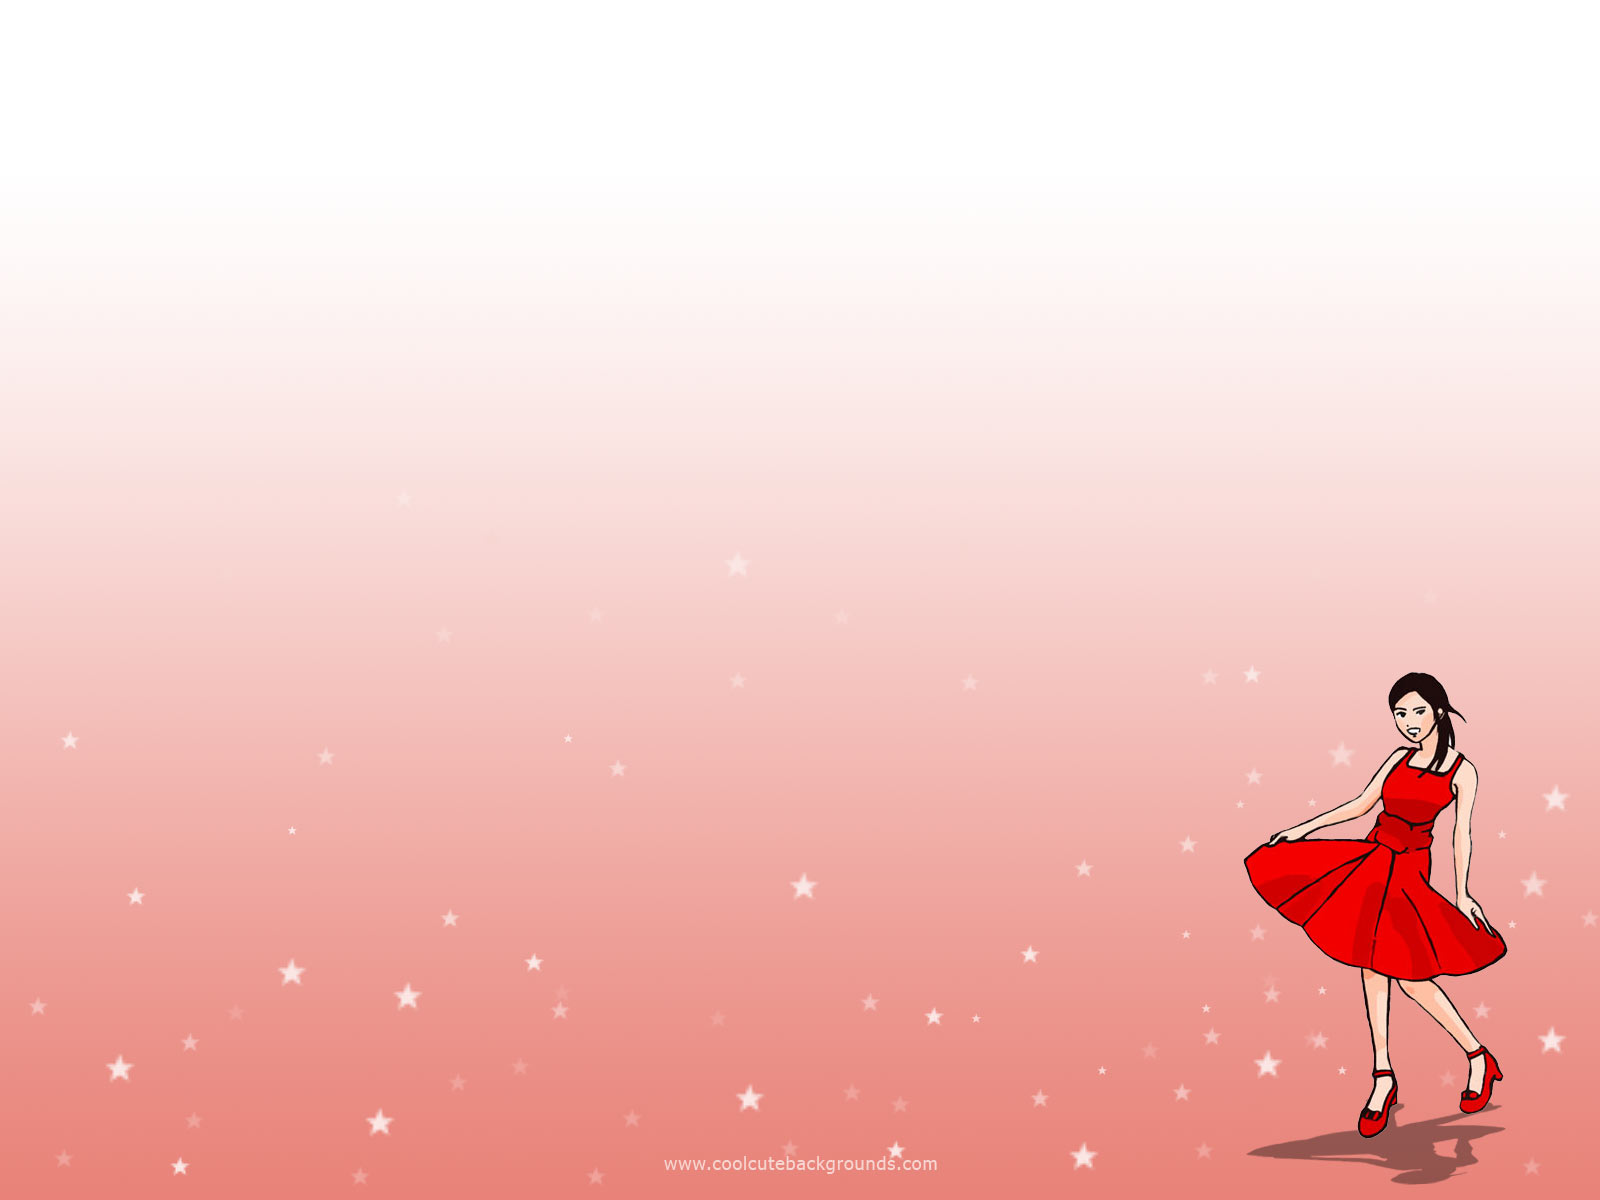 Cute Desktop Backgrounds for Girls